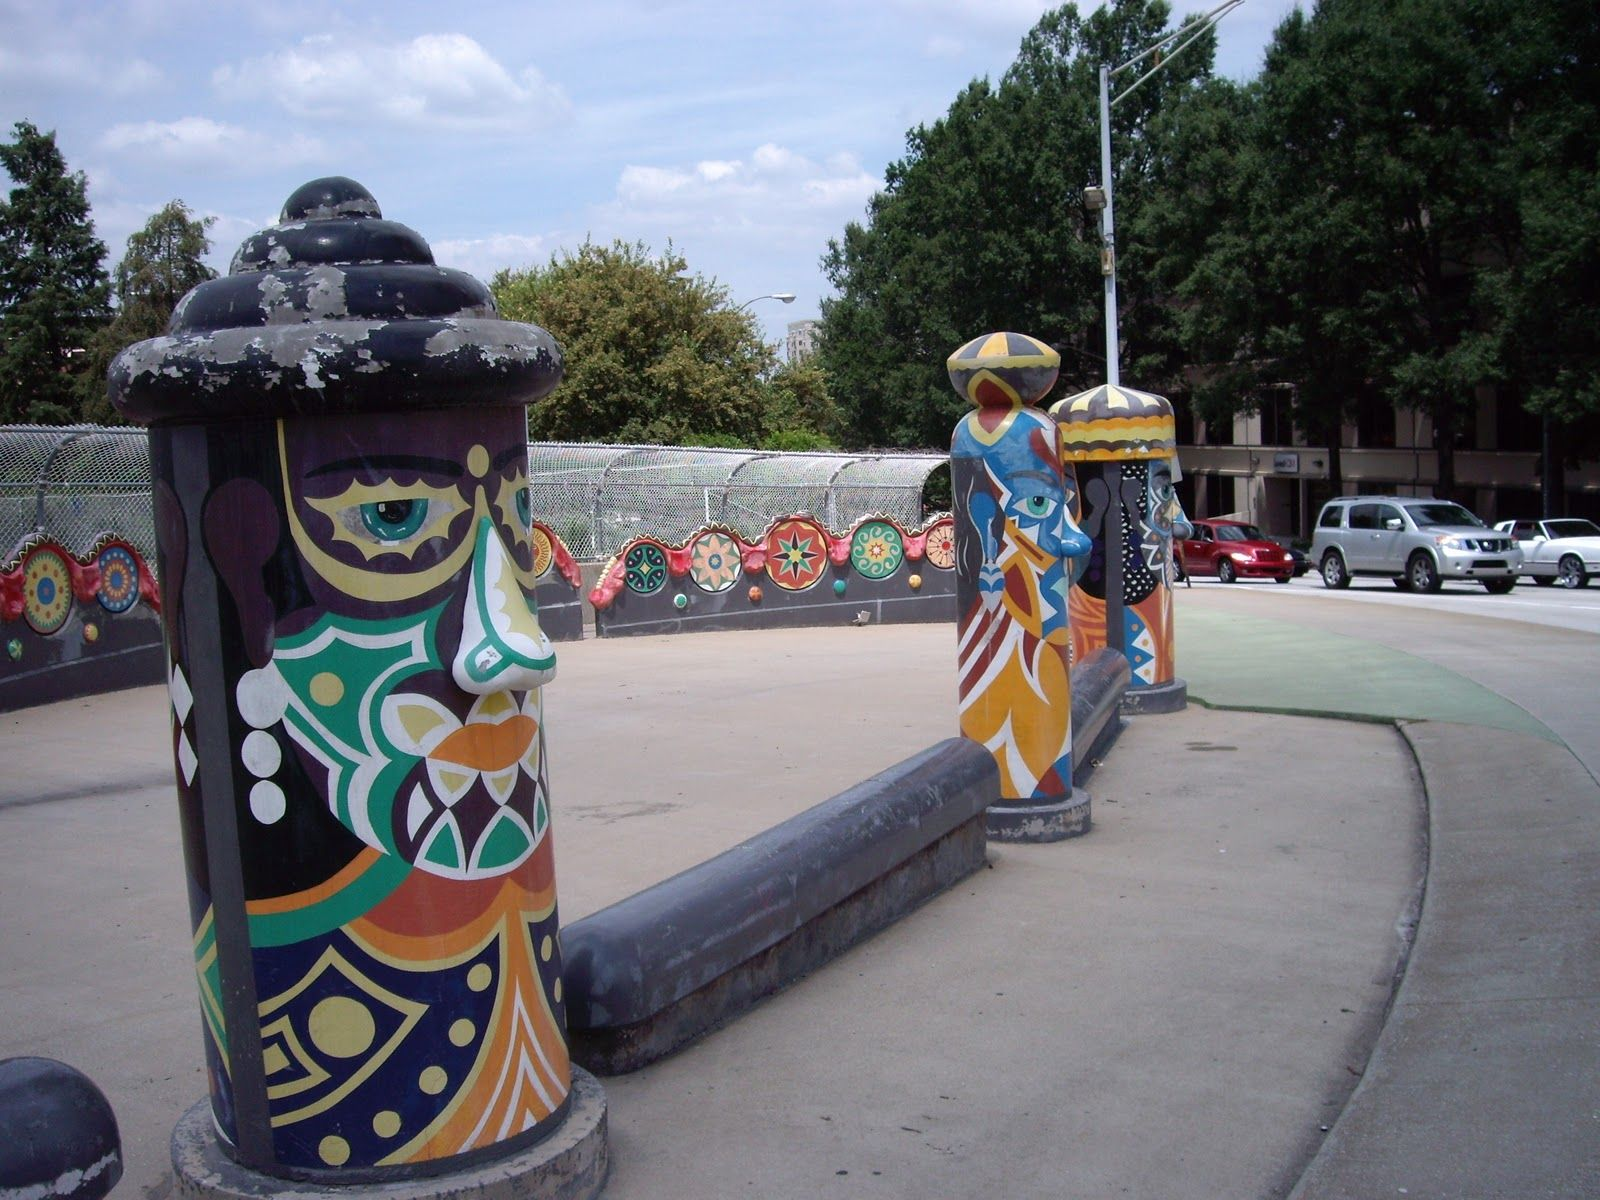 Atlanta folk art park urban art art folk art